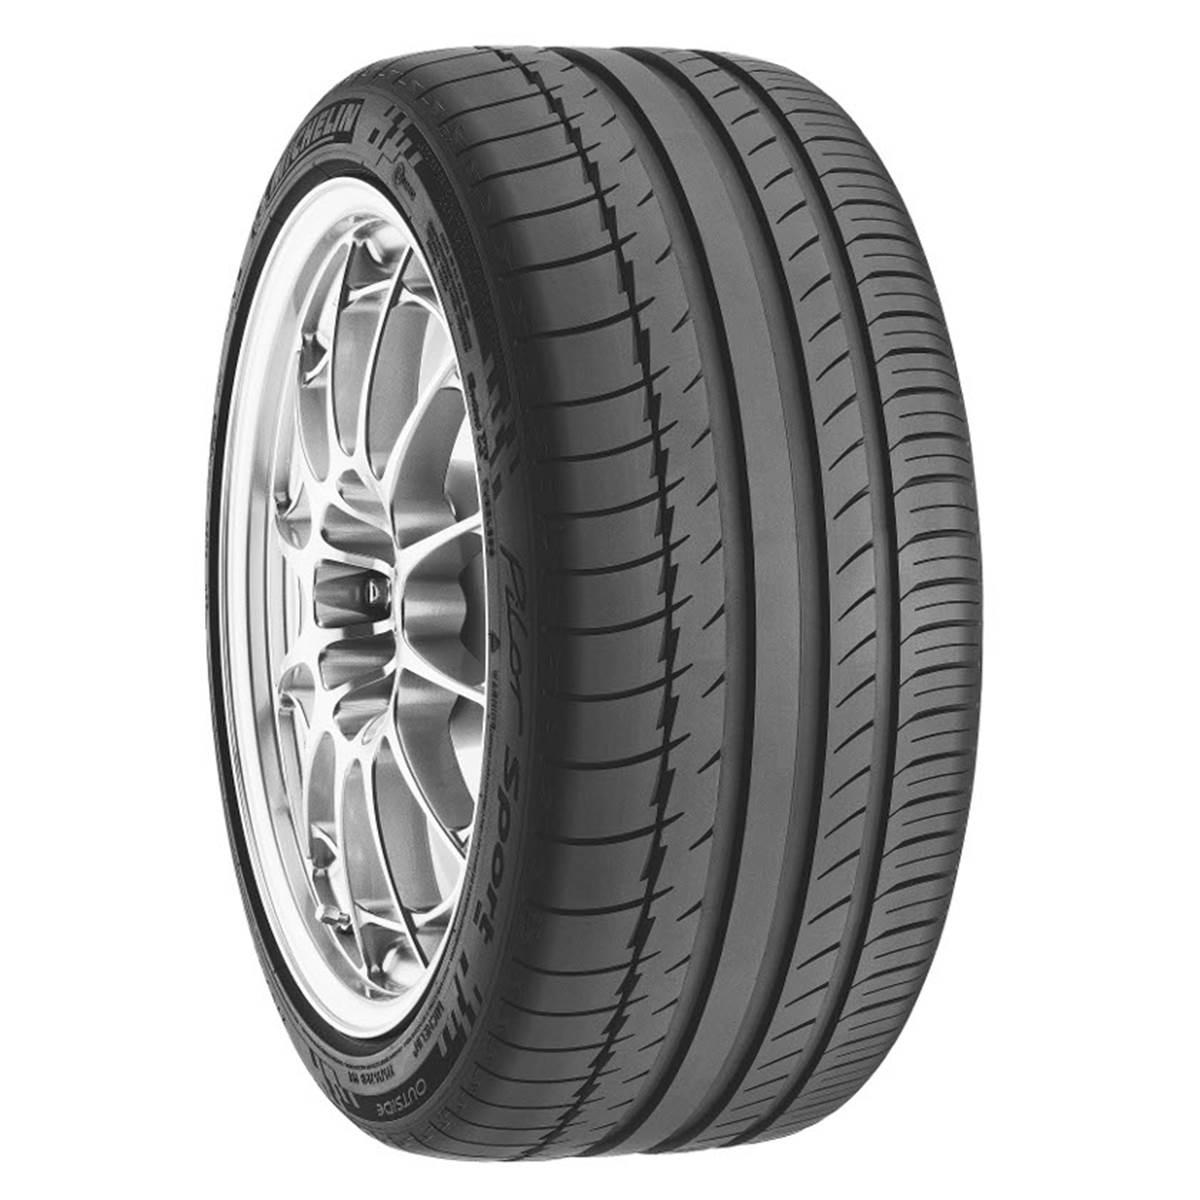 Pneu Michelin 295/25R22 97Y Pilot Sport Ps2 XL